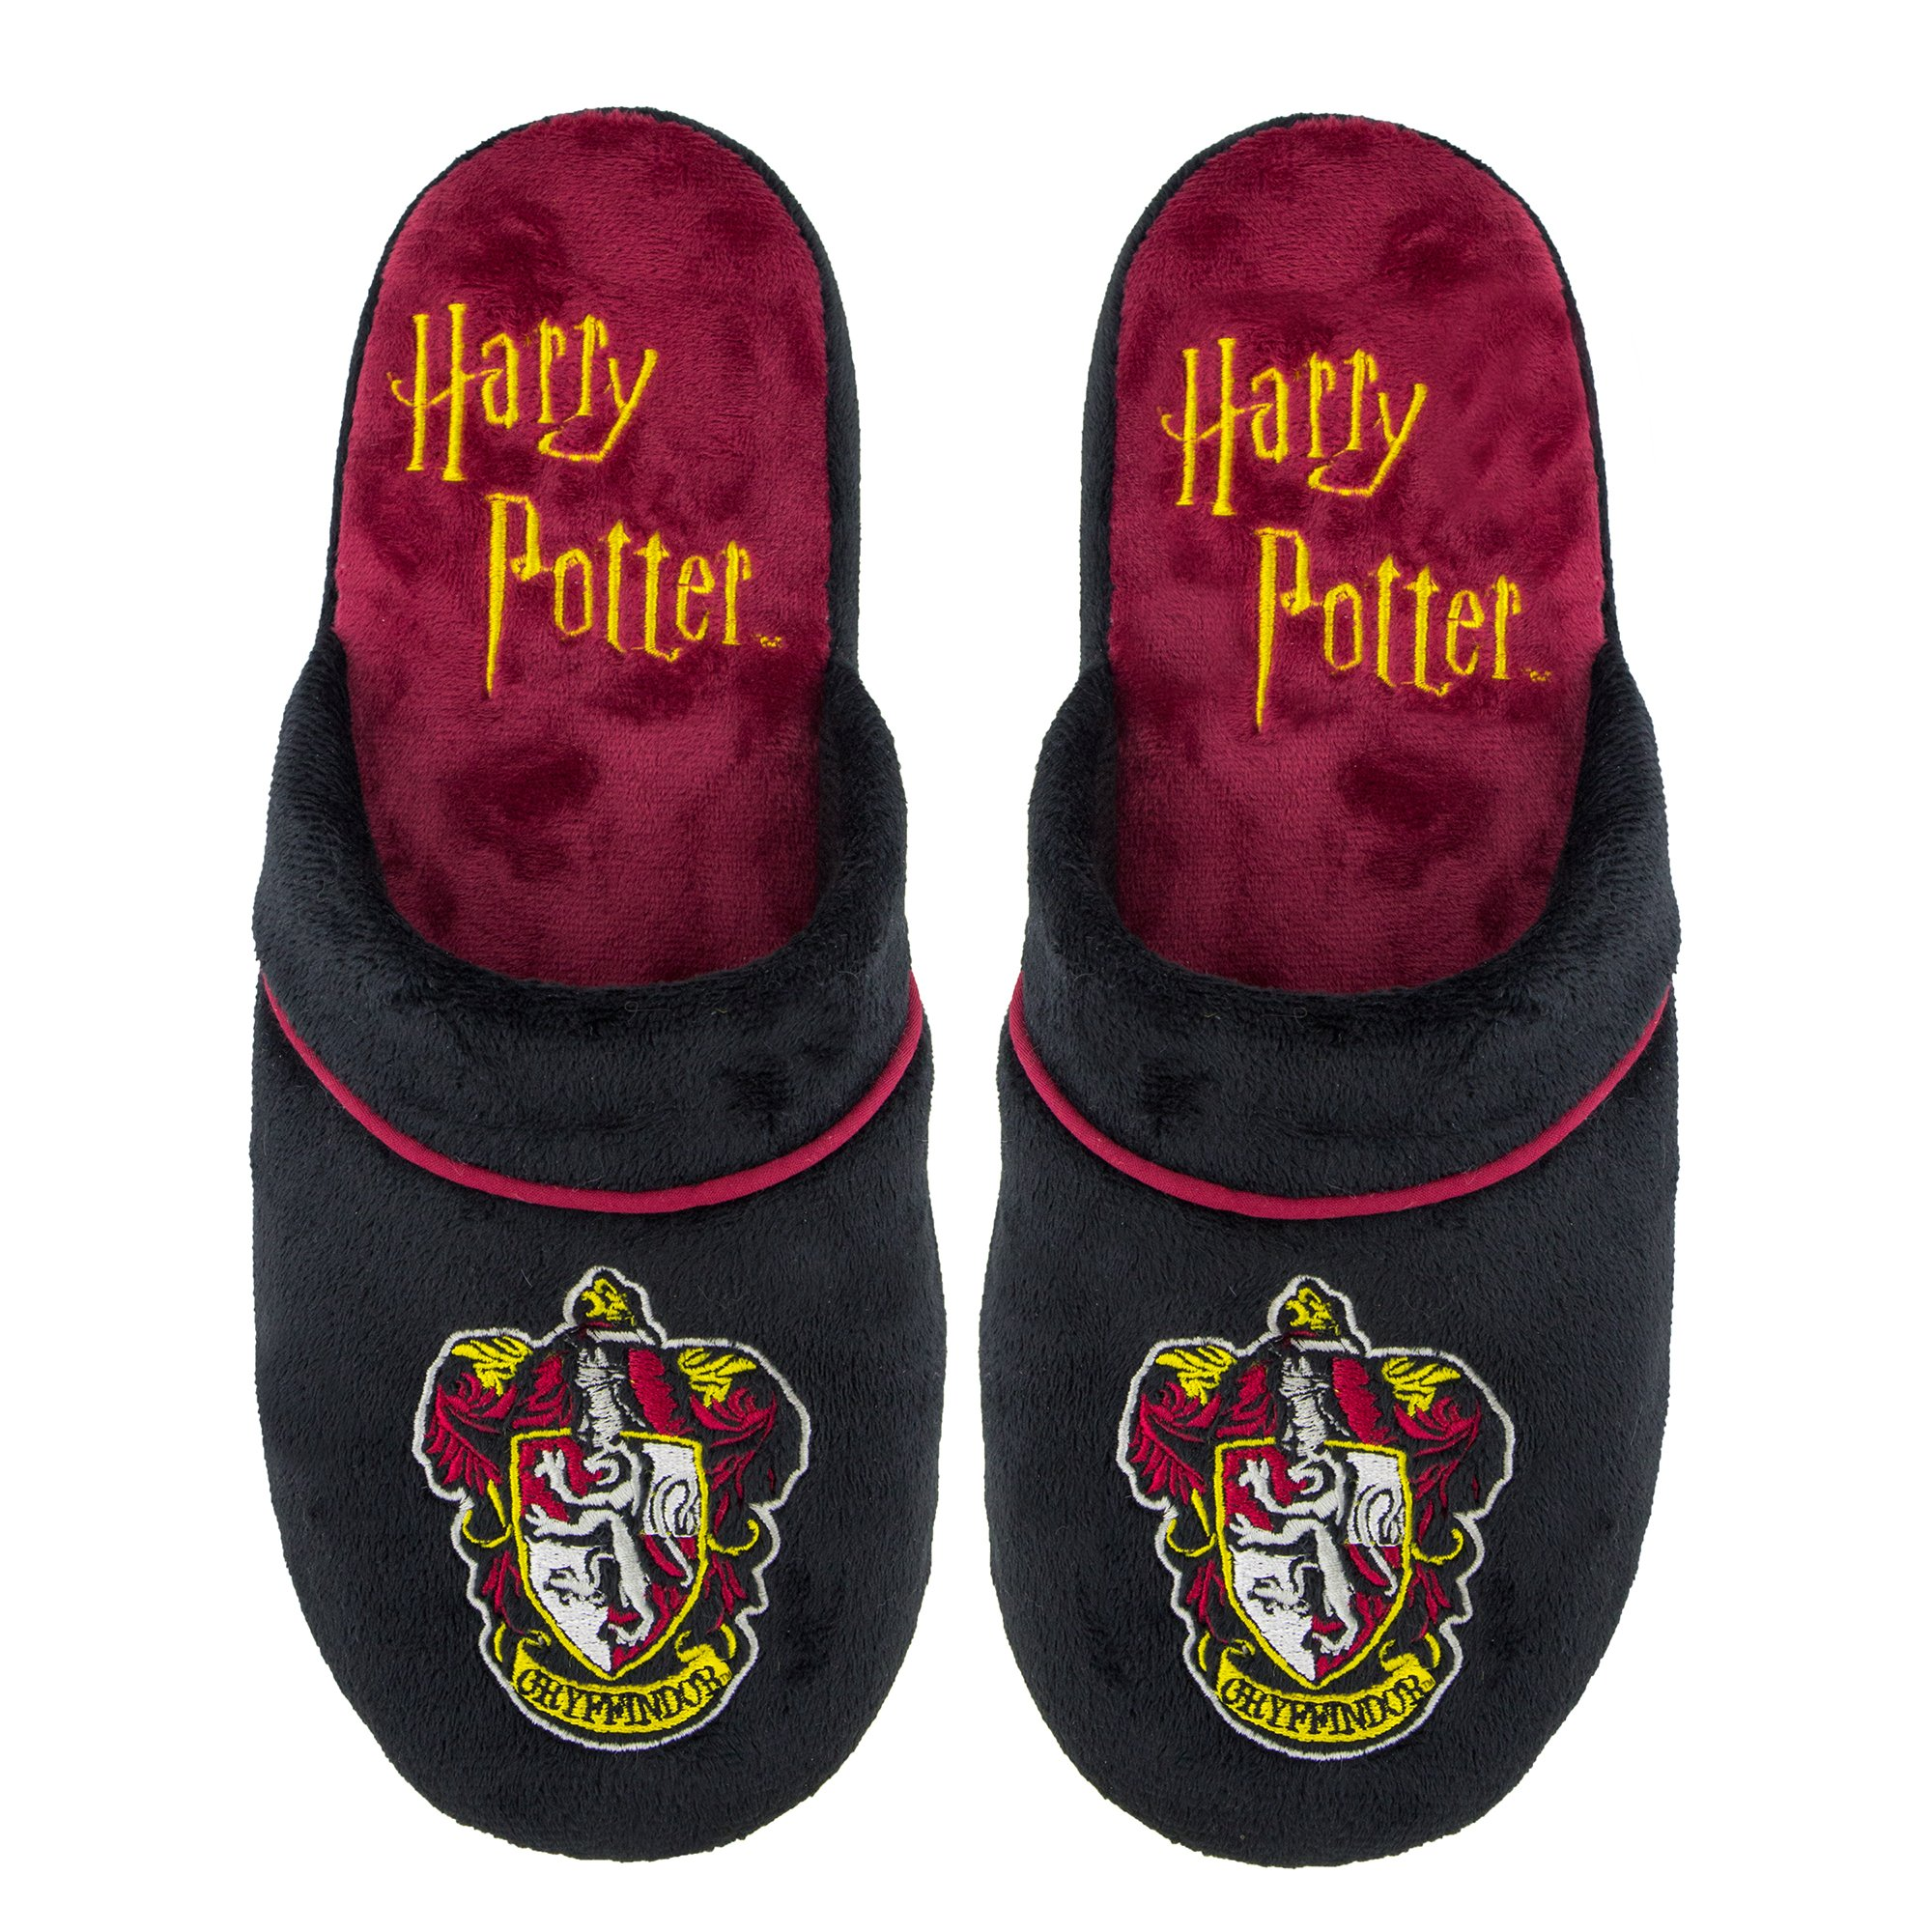 Cinereplicas Papuče Chrabromil Harry Potter Veľkosť Papuče: 41-45